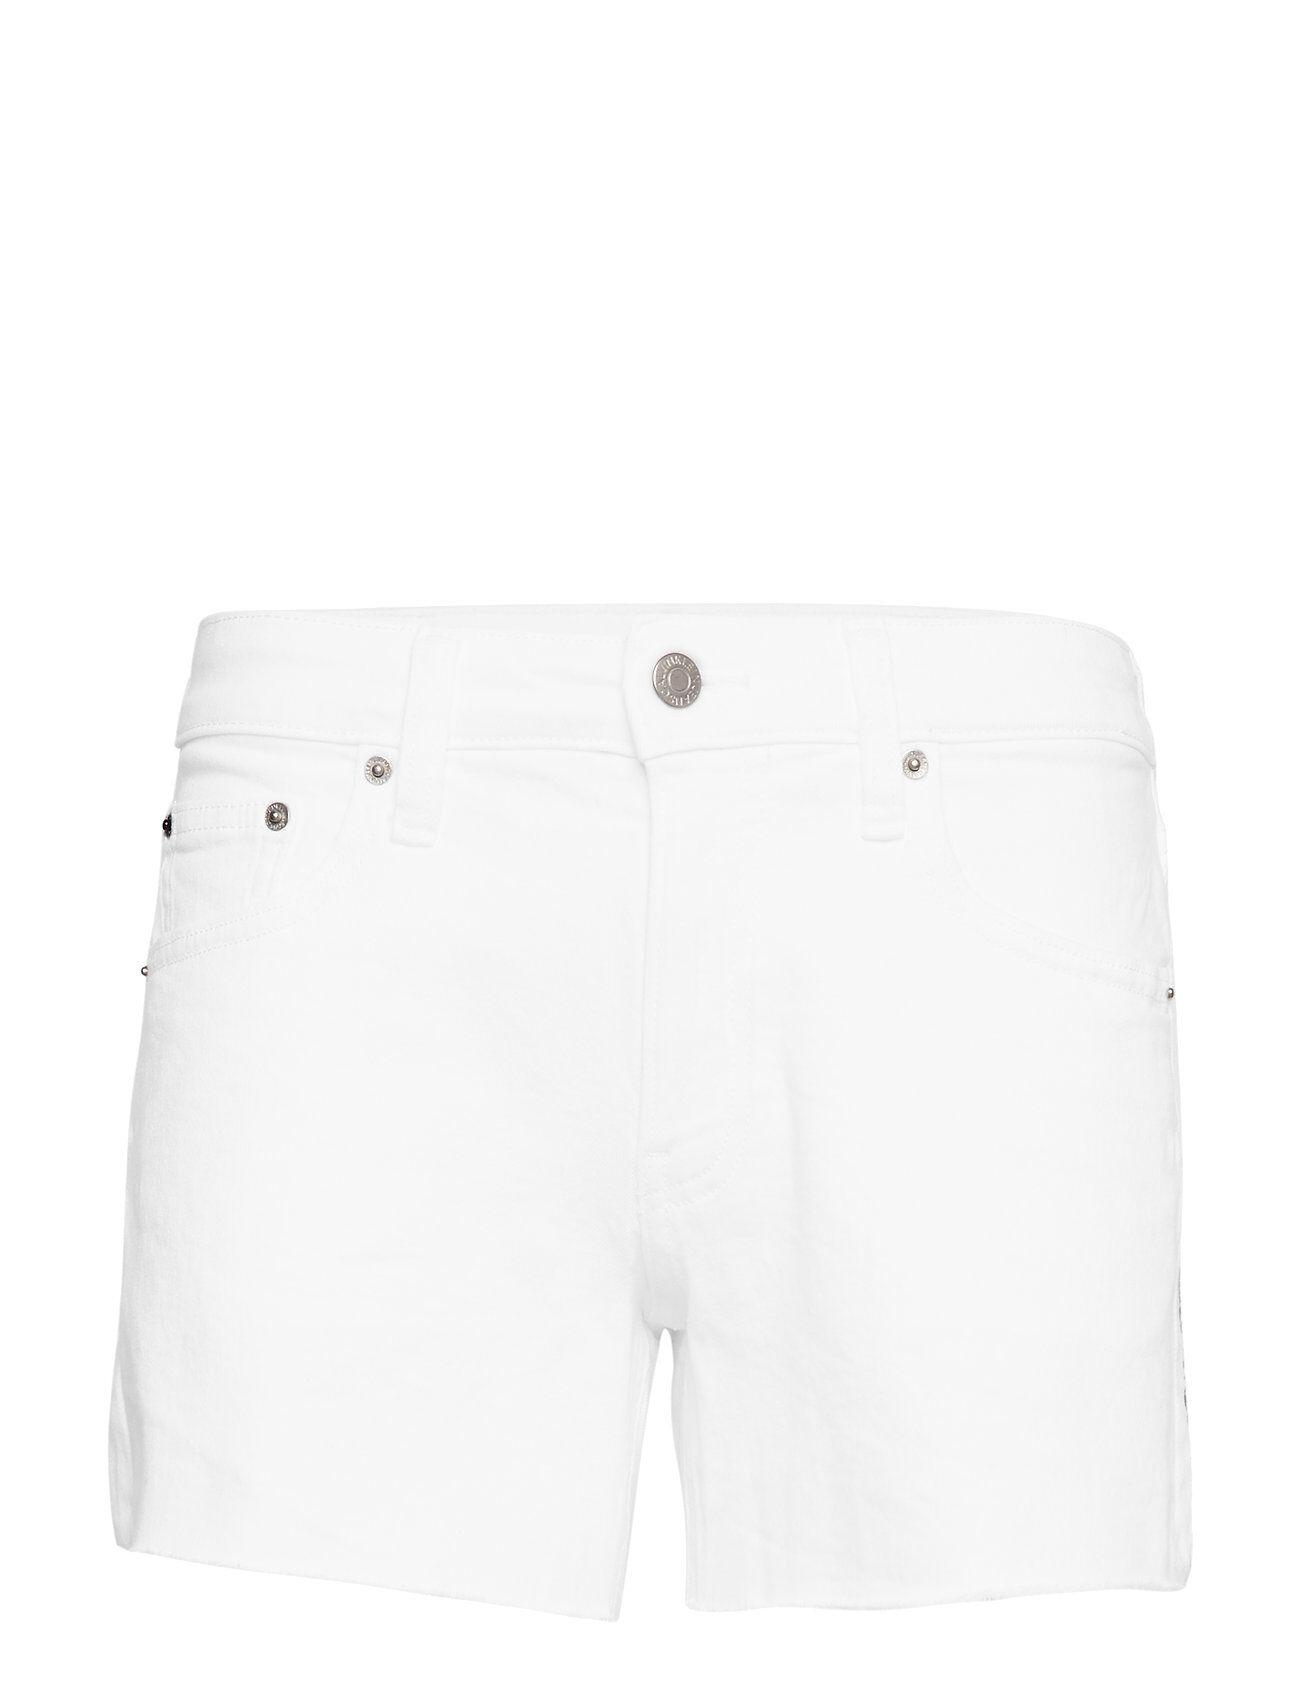 Image of Calvin Mid Rise Weekend Short Shorts Denim Shorts Valkoinen Calvin Klein Jeans